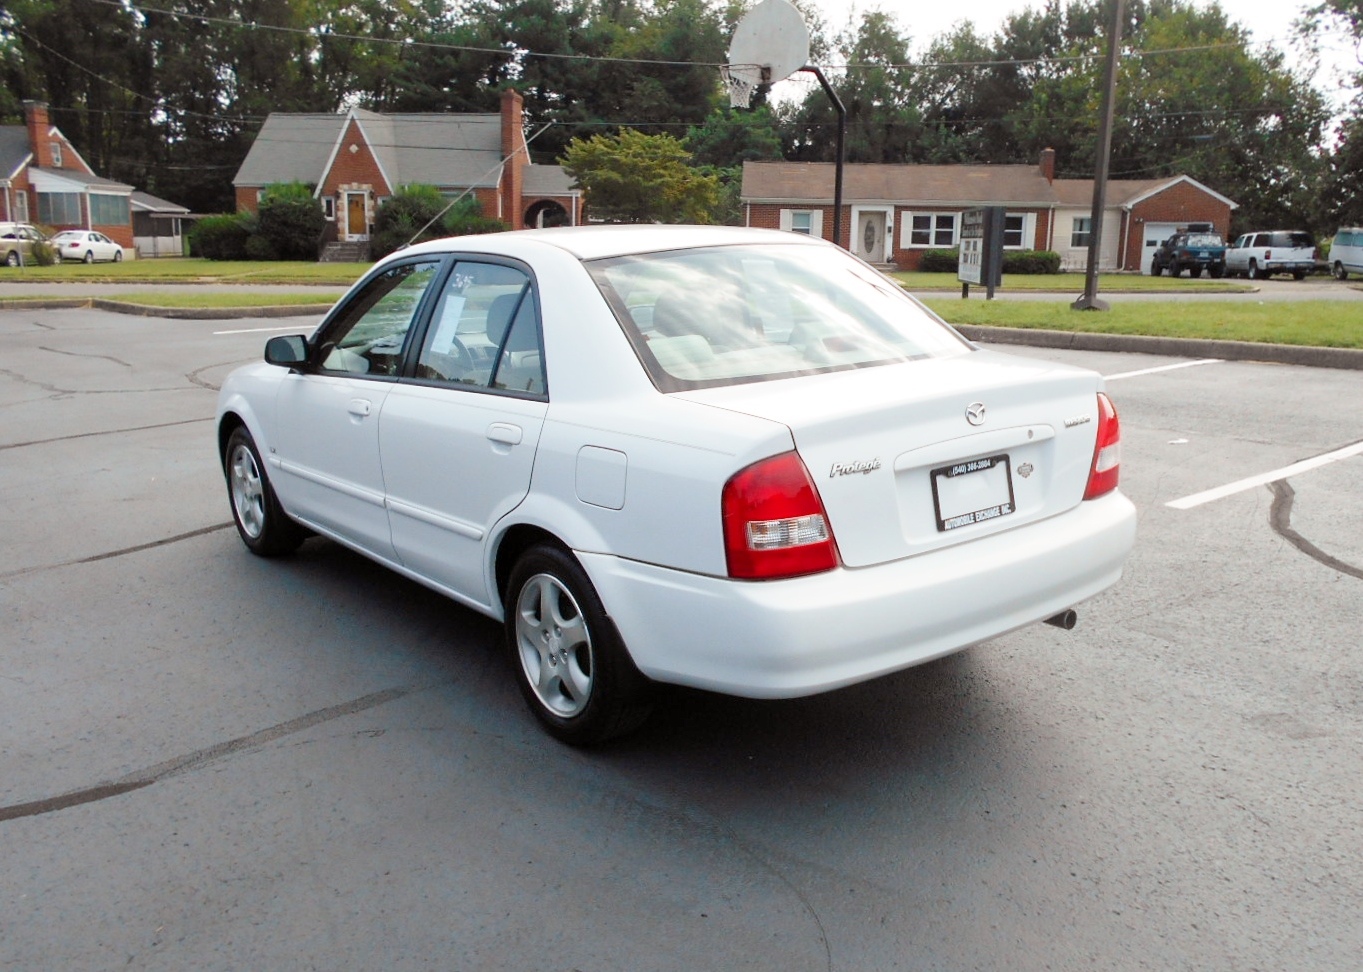 2002 mazda protege lx 007 2002 mazda protege lx 007 – automobile